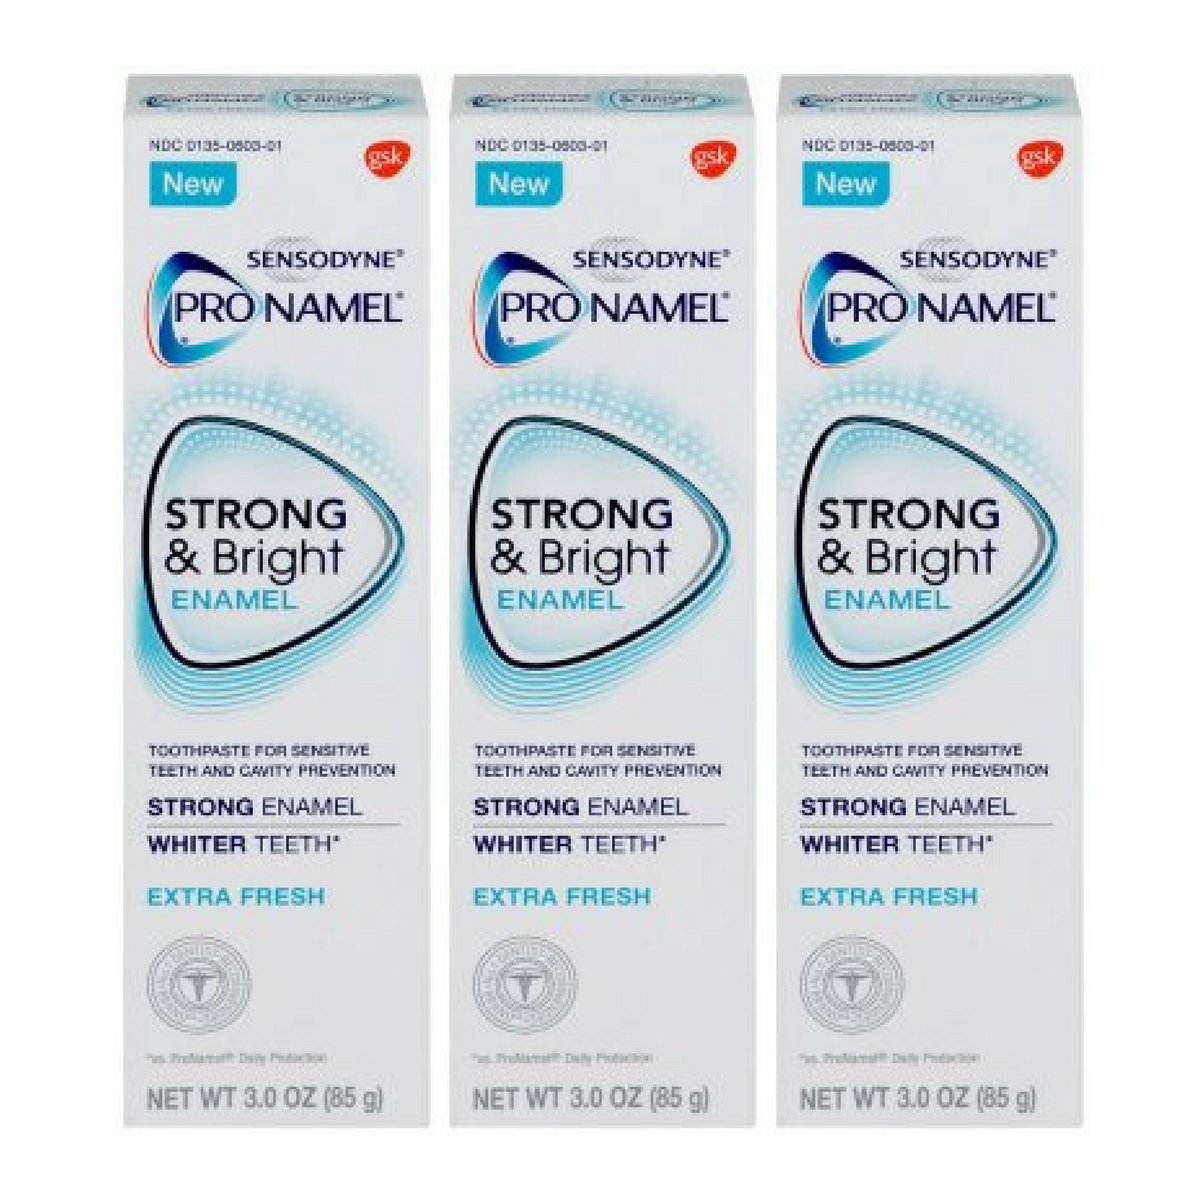 Pronamel Strong & Bright, Whitening Enamel Toothpaste, Extra Fresh, 3 ounce - 3 Pack